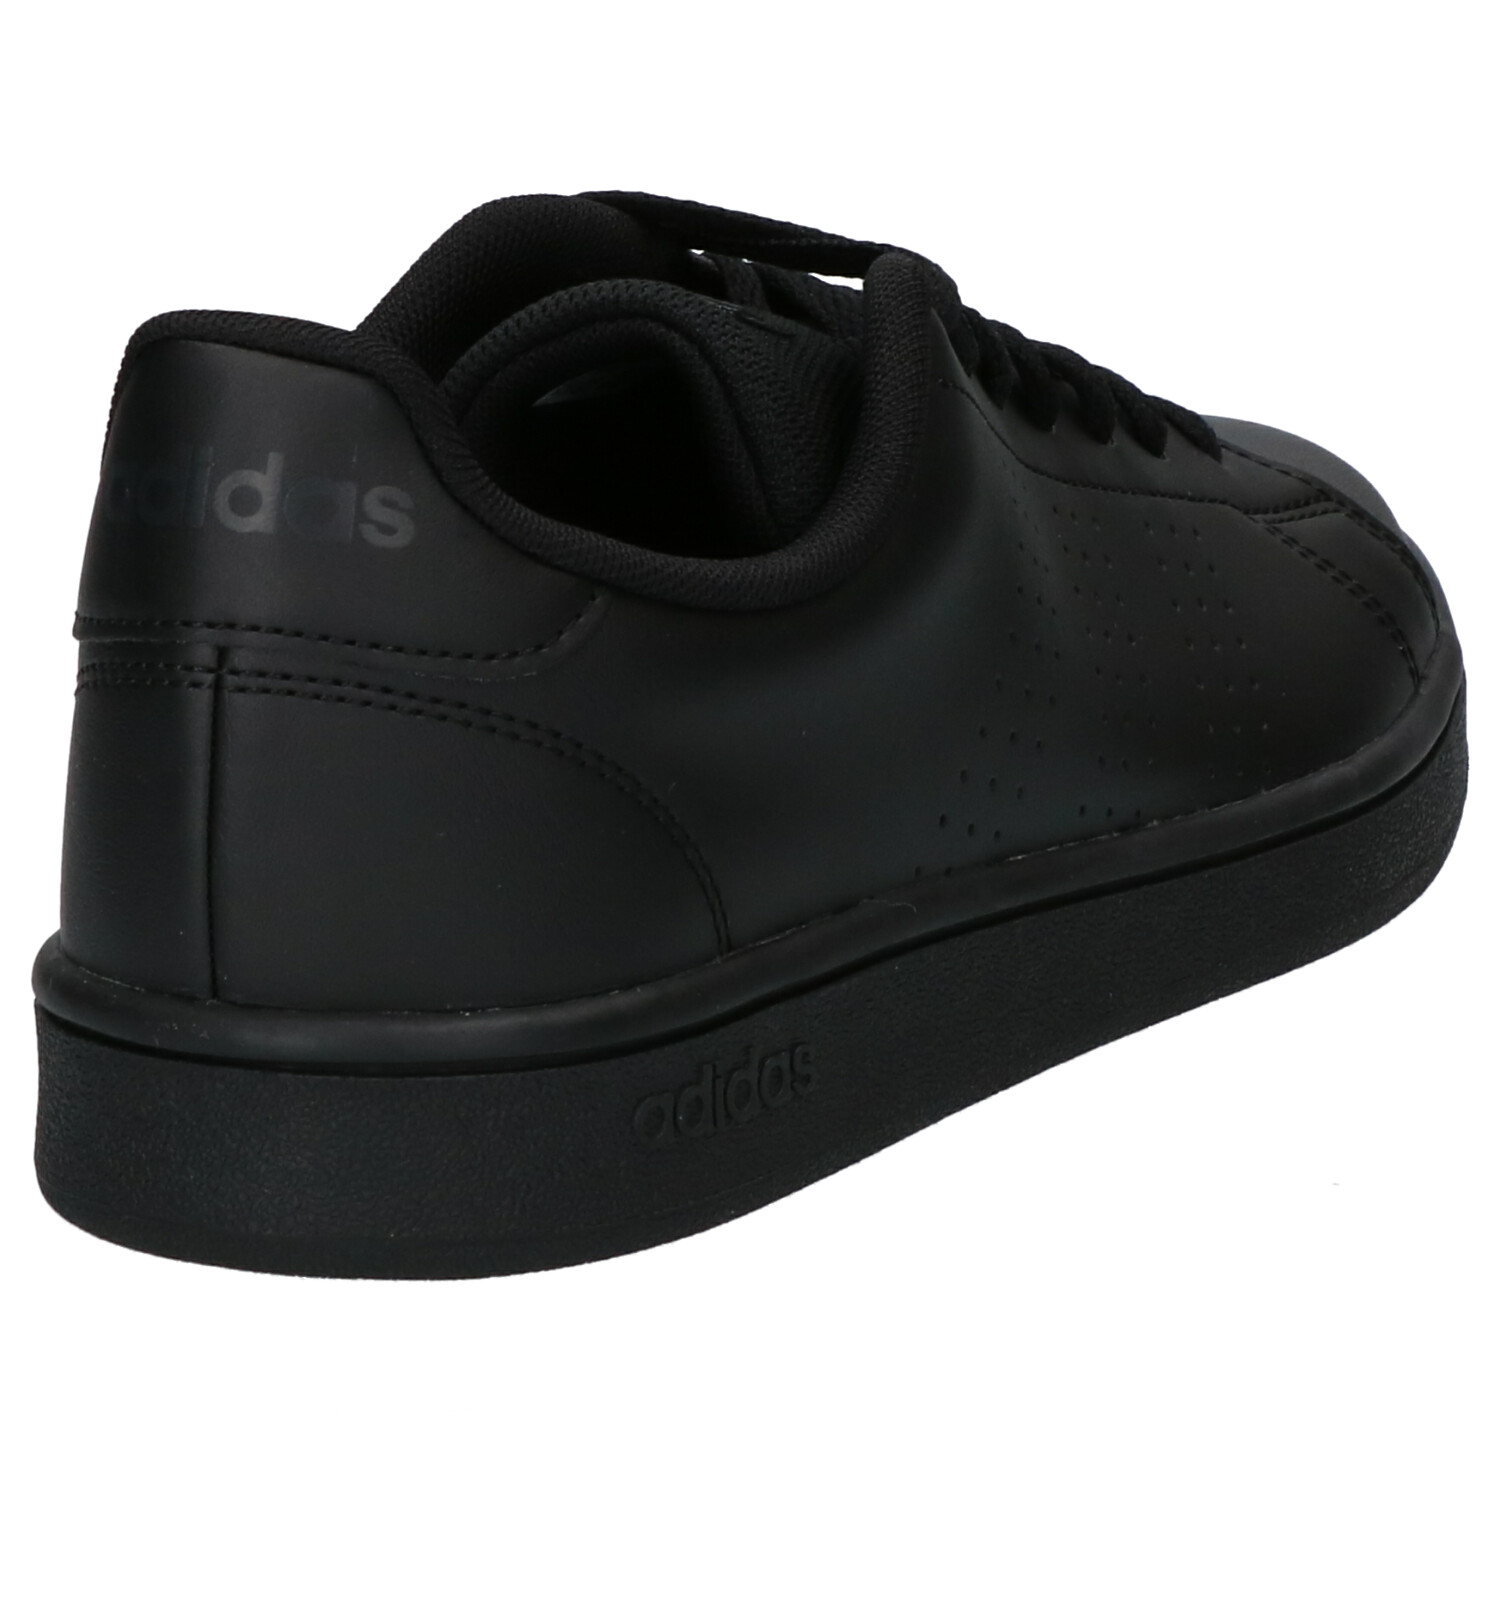 Base Adidas Base Zwarte Zwarte Adidas Sneakers Adidas Advantage Sneakers Zwarte Sneakers Advantage y0wO8vmPNn